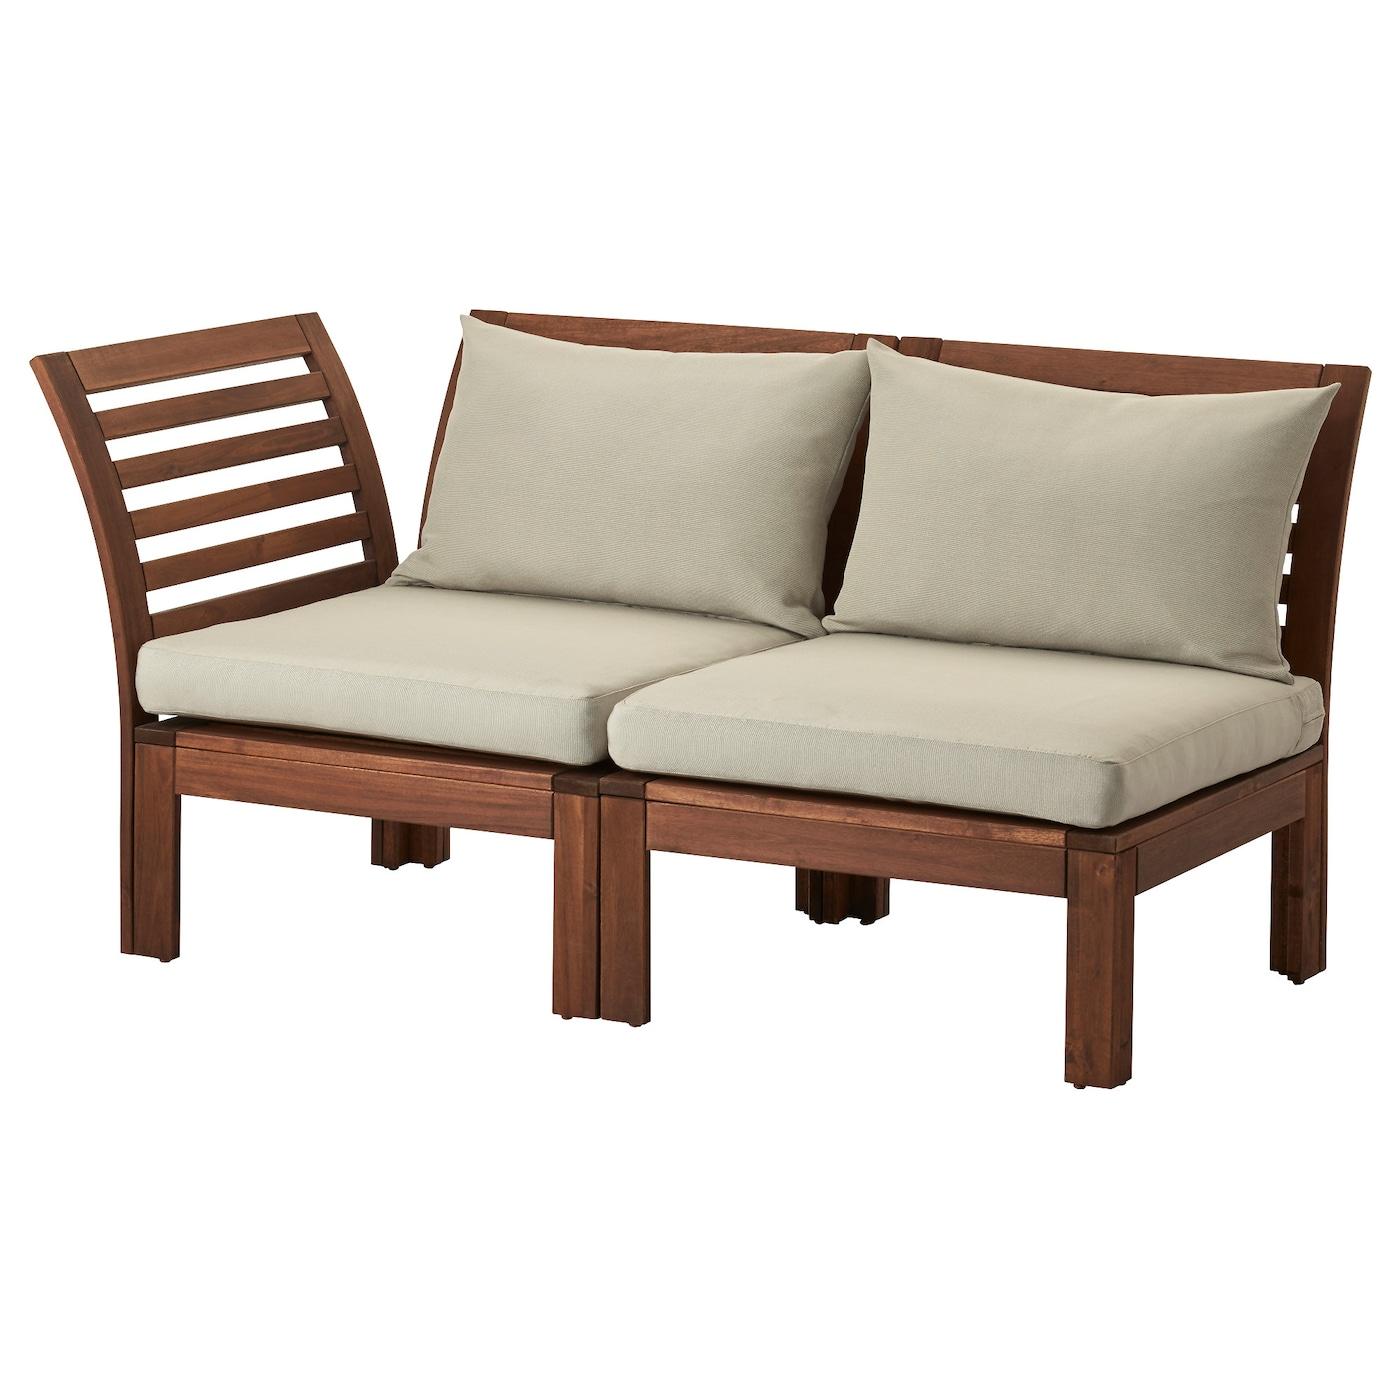 pplar canap 2 pl modulable ext rieur brun h ll beige 143 x 80 x 73 cm ikea. Black Bedroom Furniture Sets. Home Design Ideas